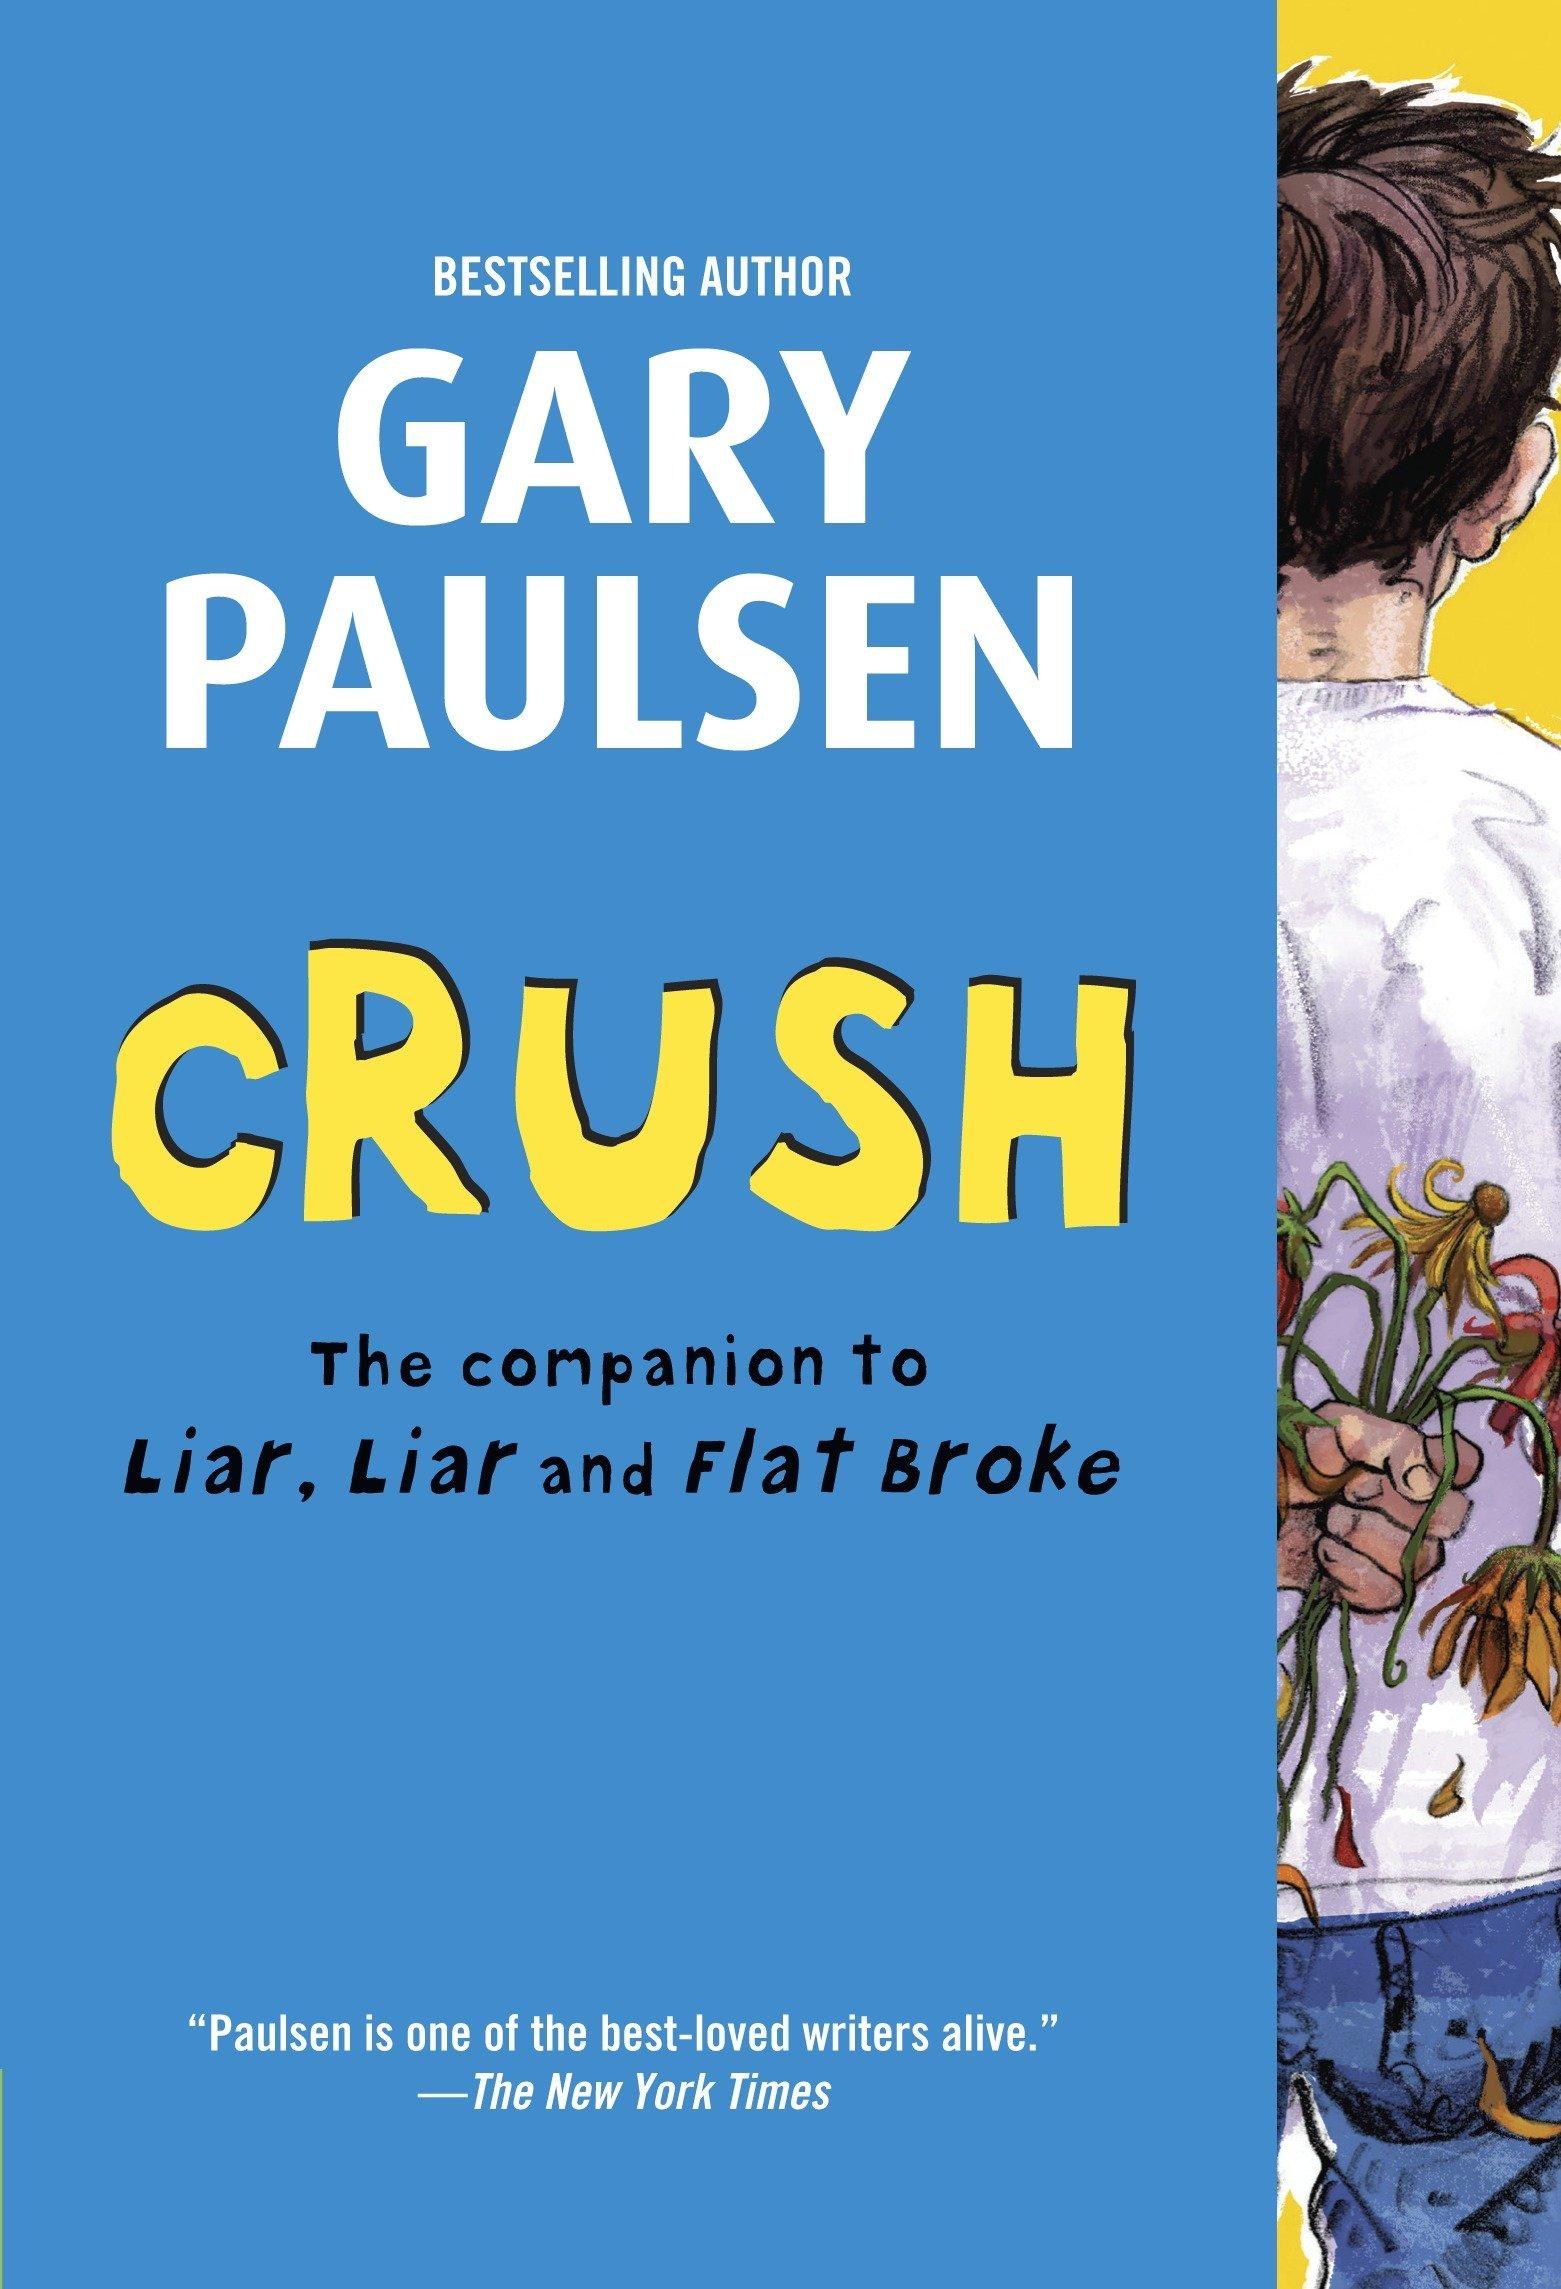 Amazon.com: Crush: The Theory, Practice and Destructive Properties of Love (Liar  Liar) (9780385742313): Gary Paulsen: Books